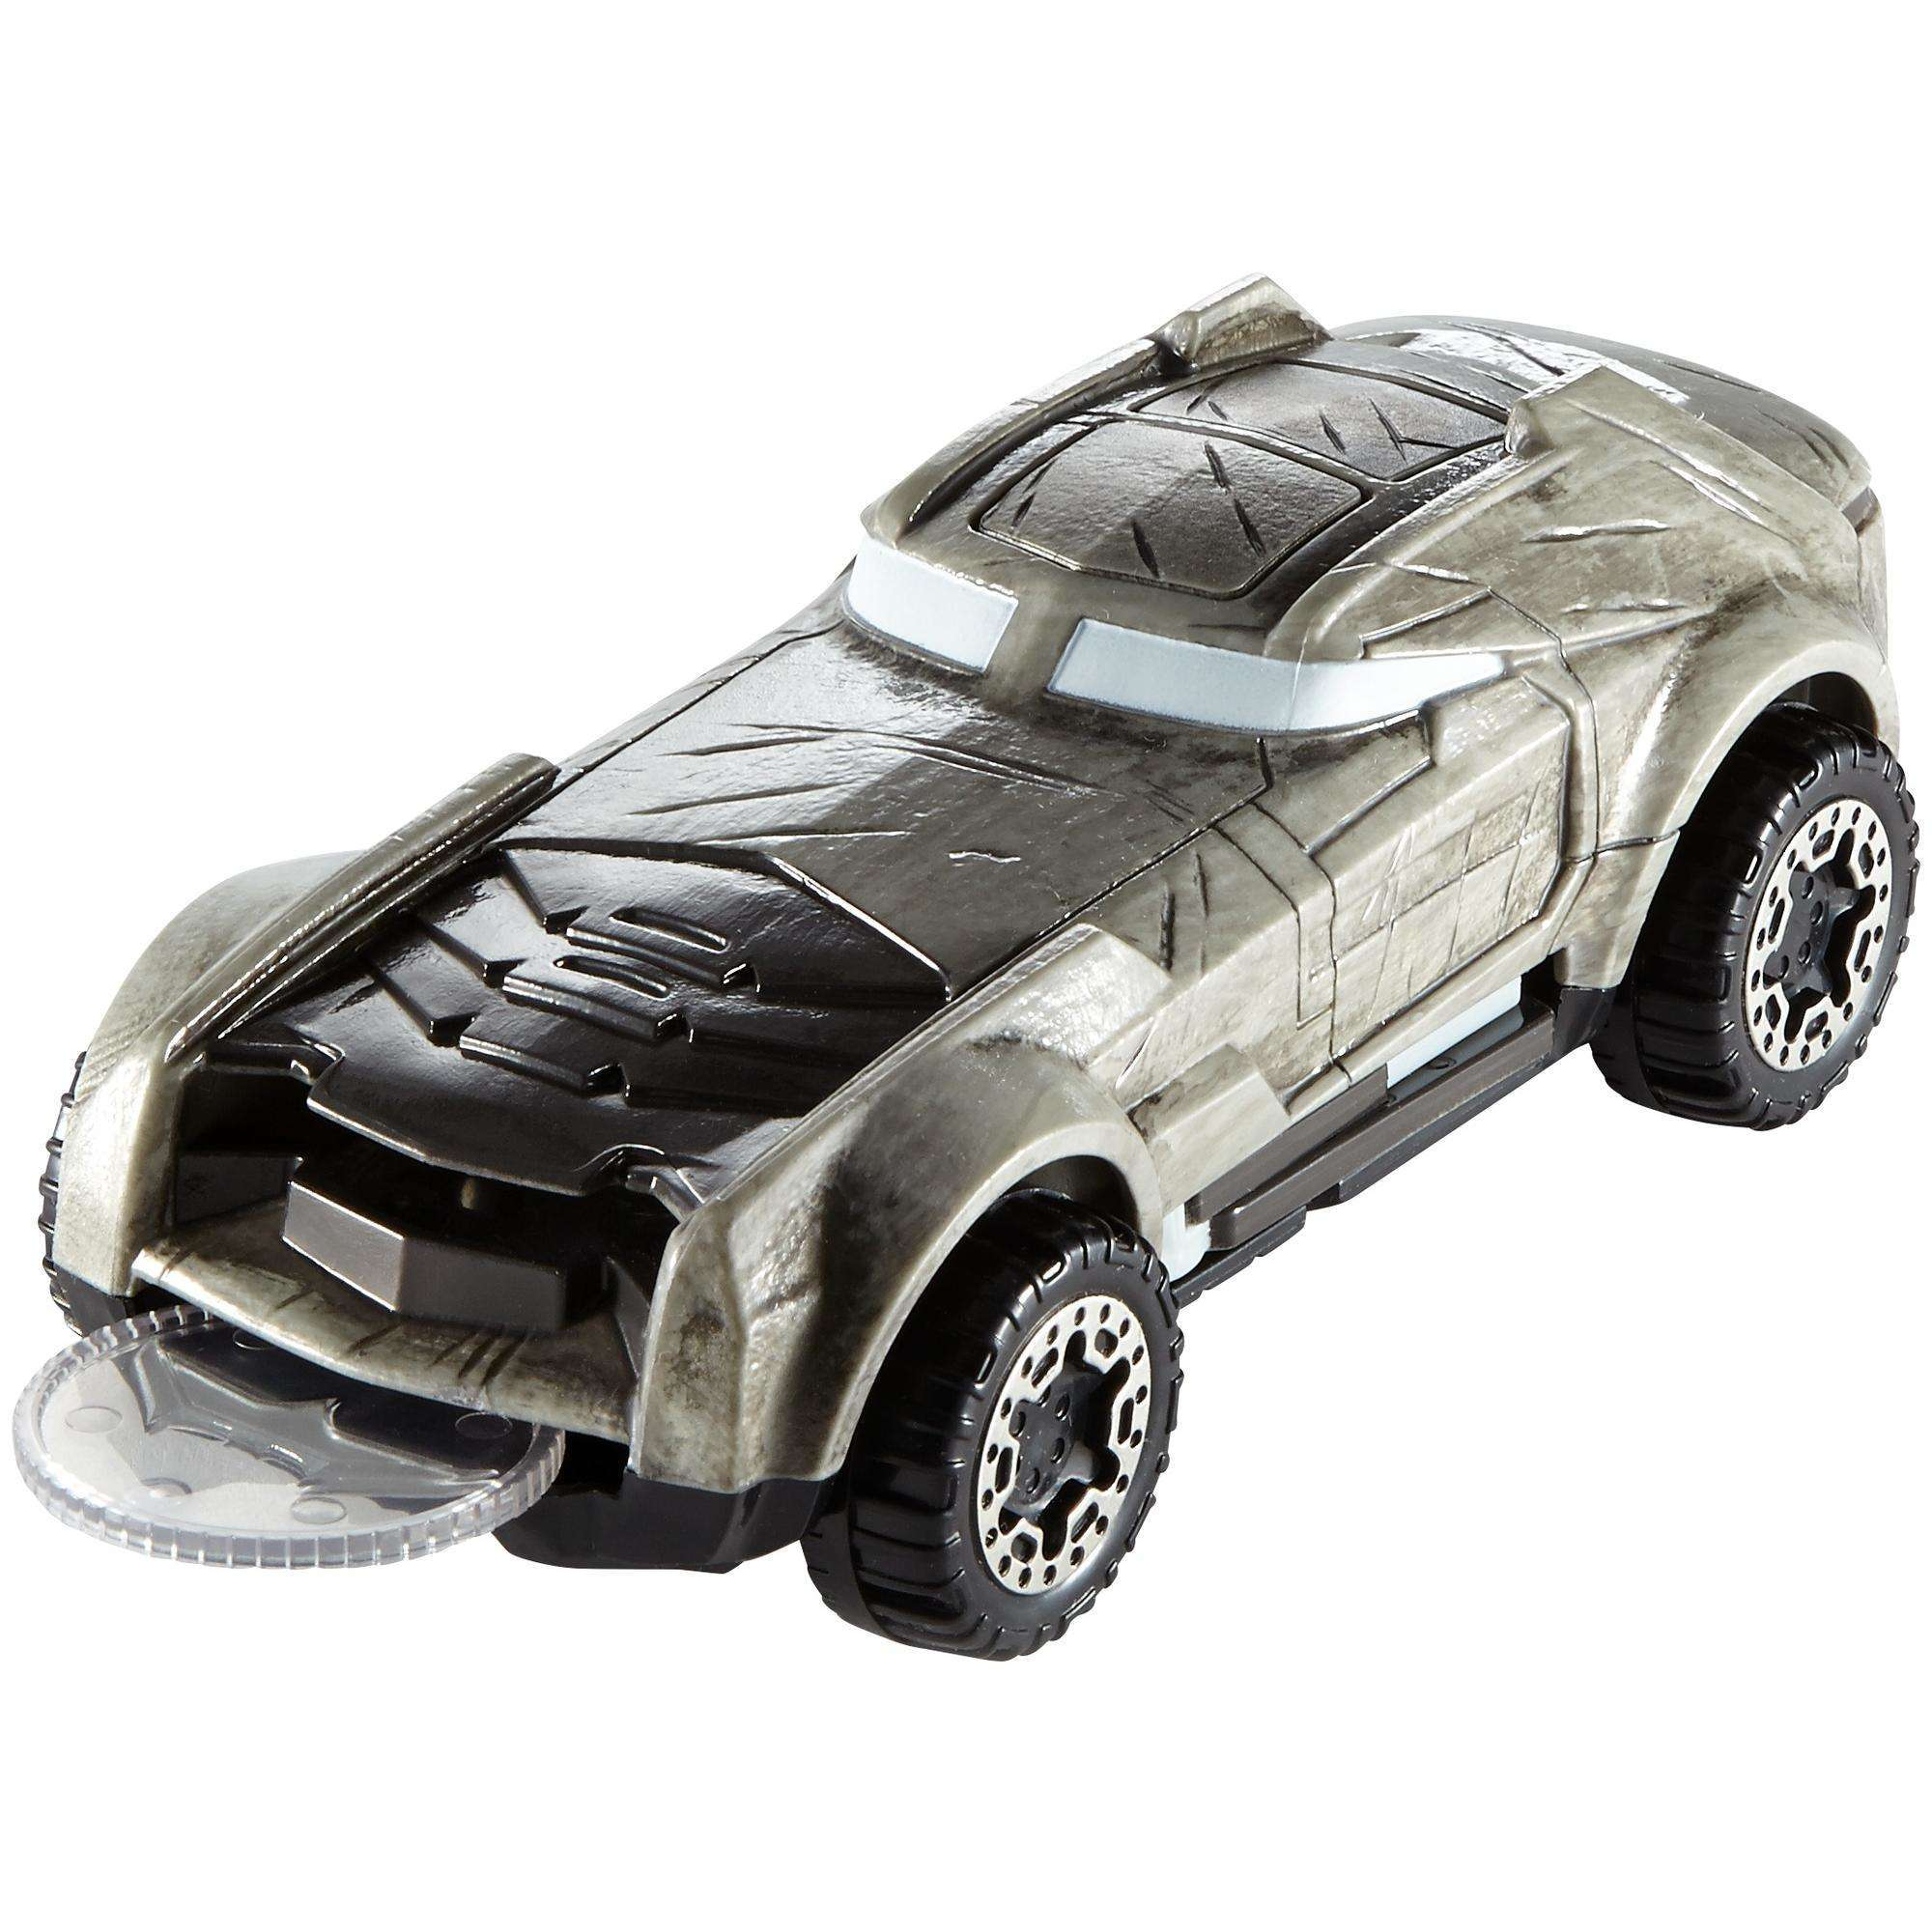 Hot Wheels DC Universe Batman Car by Mattel